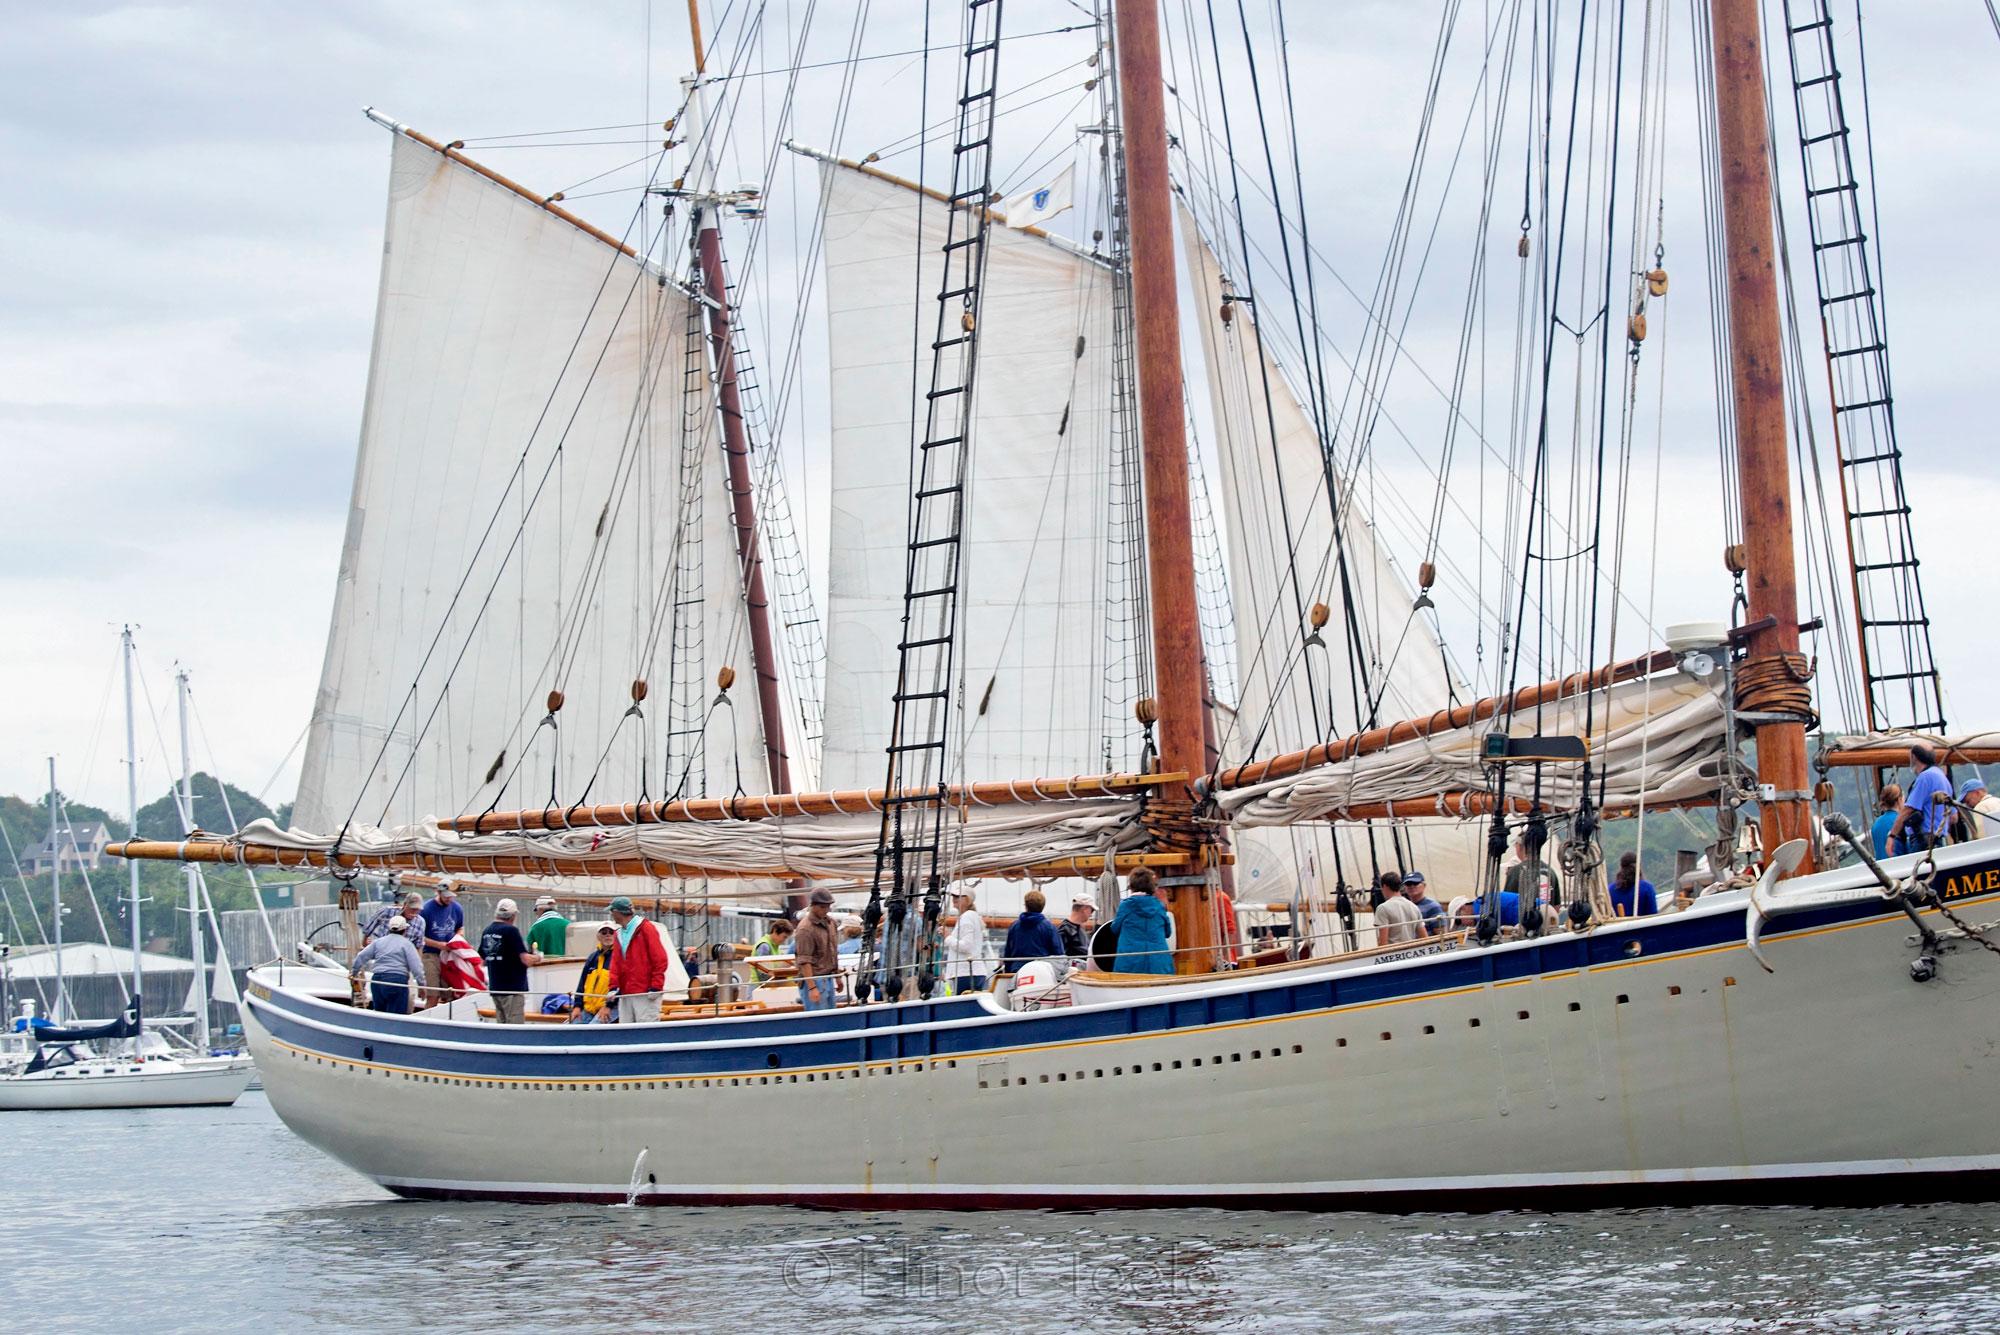 Schooner Festival 2013 American Eagle Raising Sail